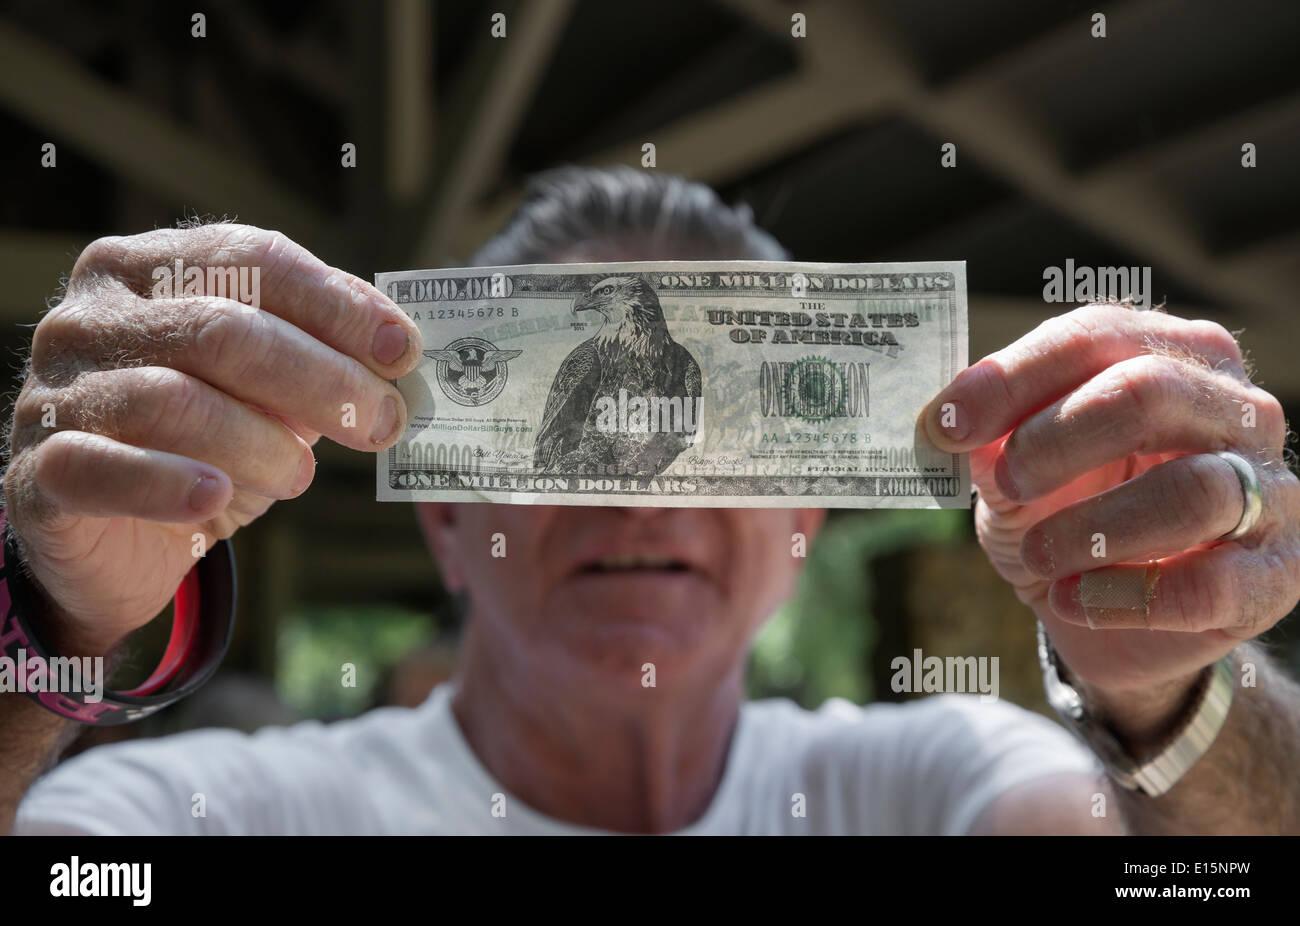 El hombre posee un falso million dollar bill. Foto de stock